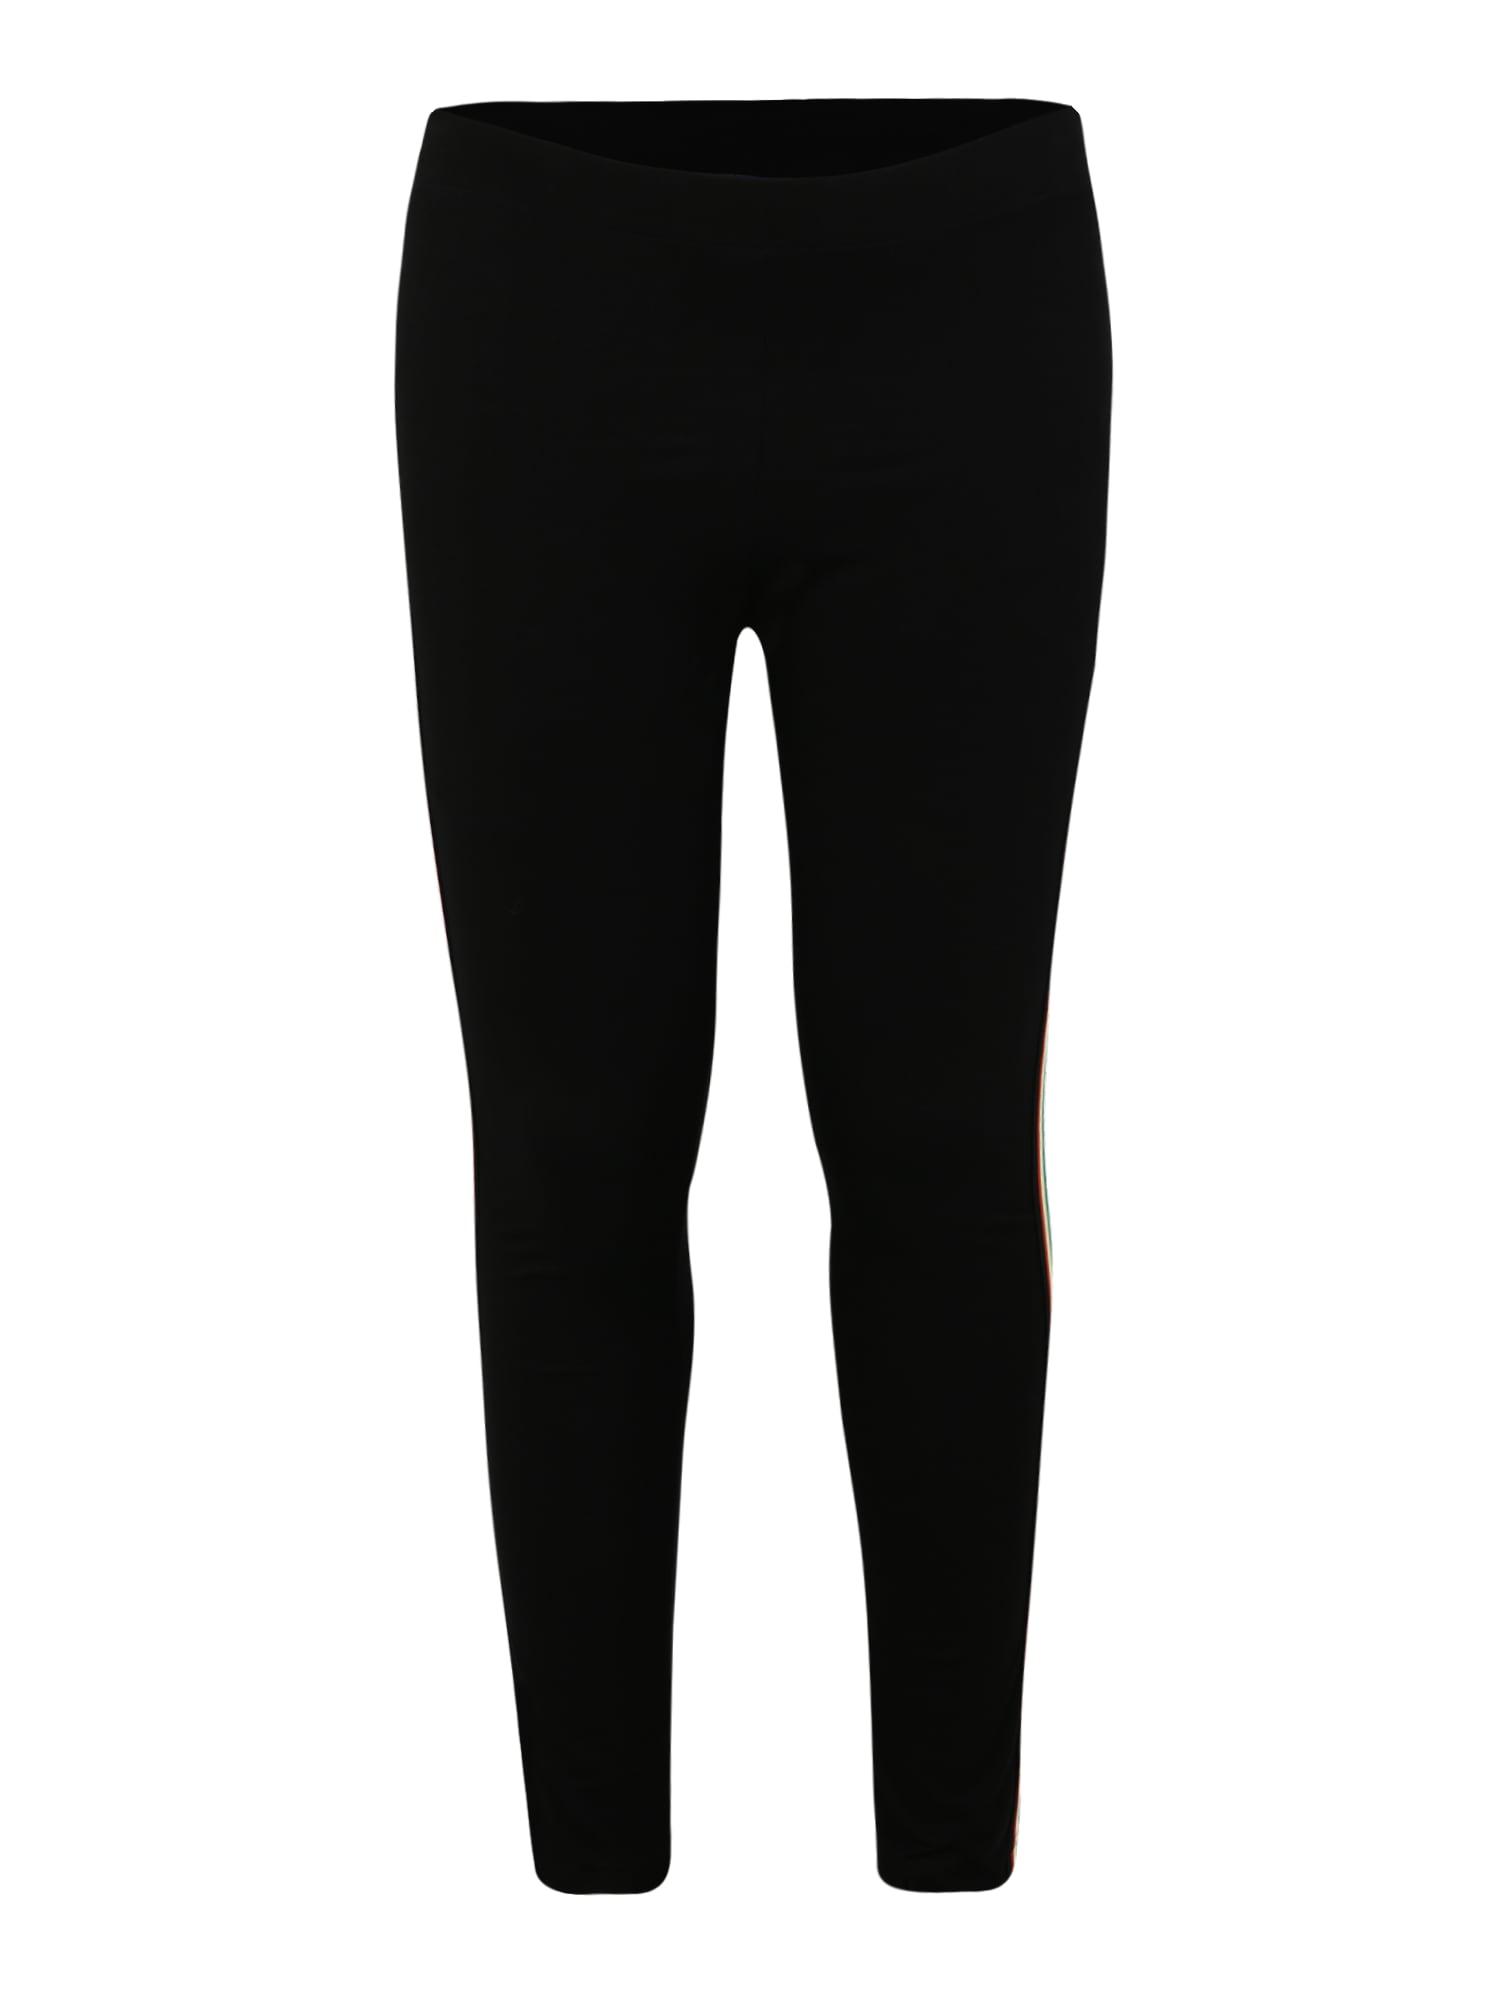 Legíny Ladies Multicolor Side Taped Leggings mix barev černá Urban Classics Curvy